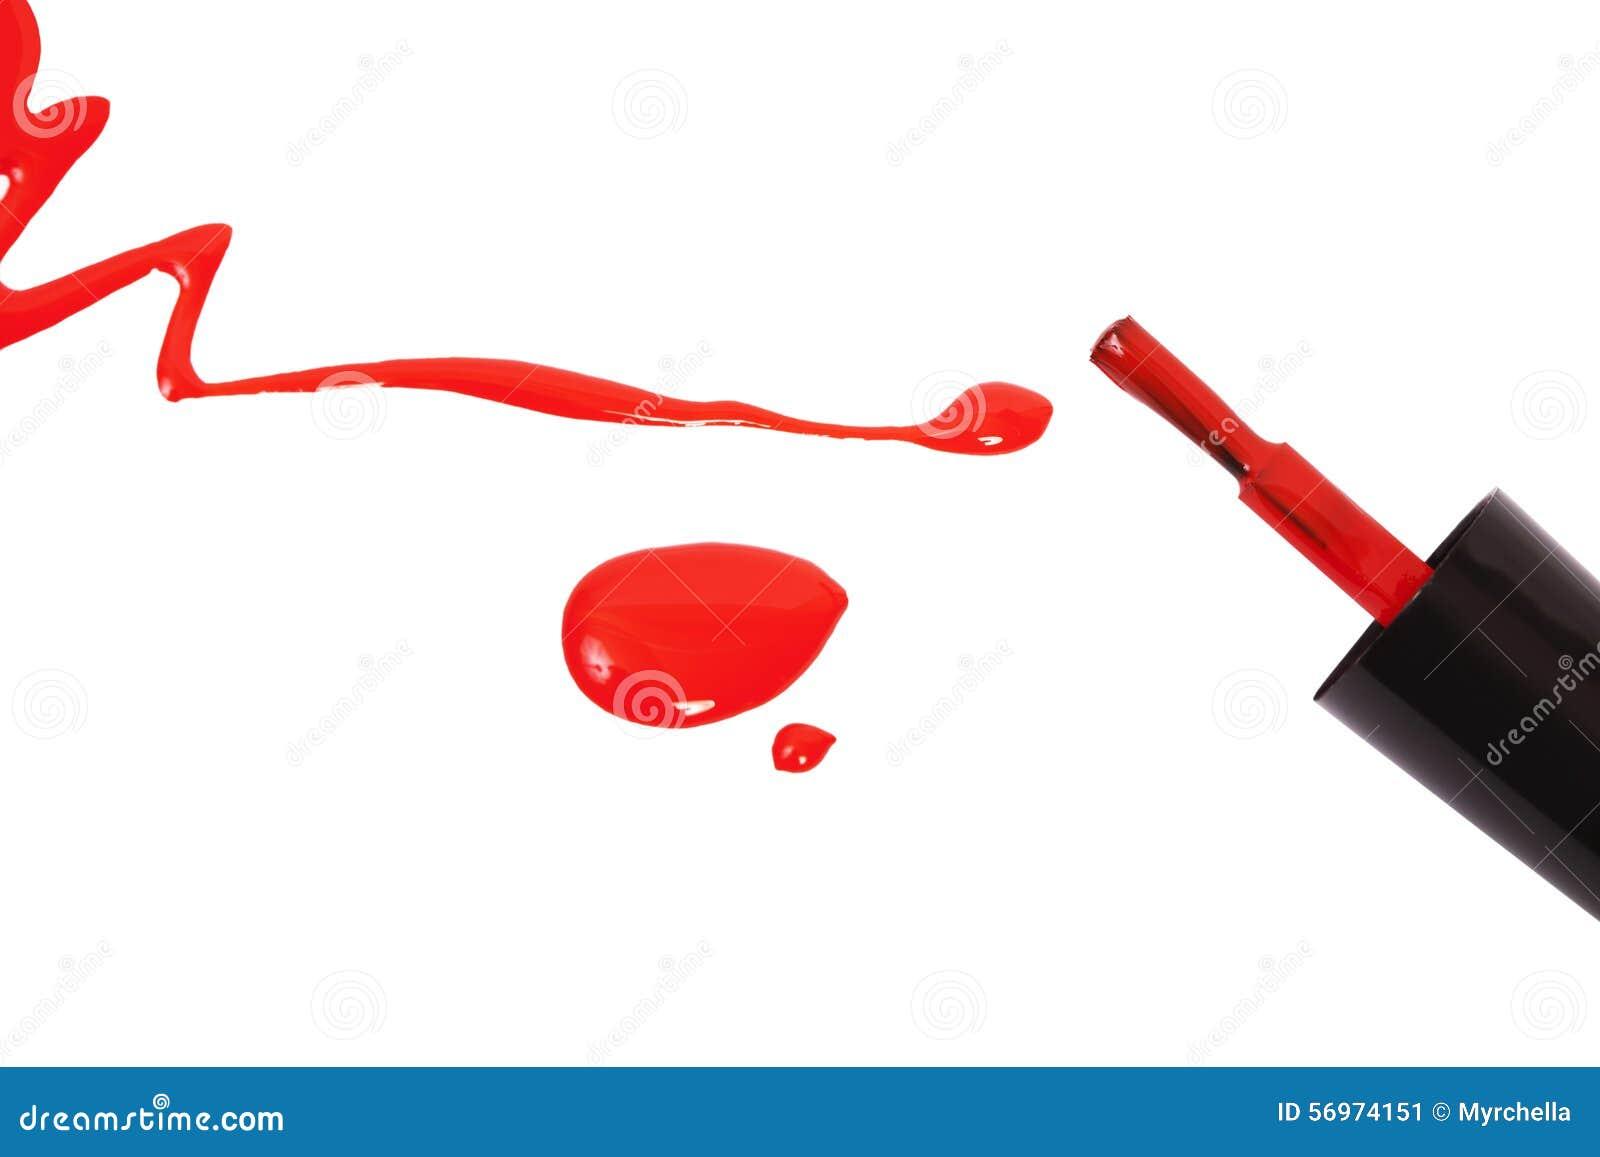 Nail Polish Dripping Brush Stock Photos - Download 214 Images